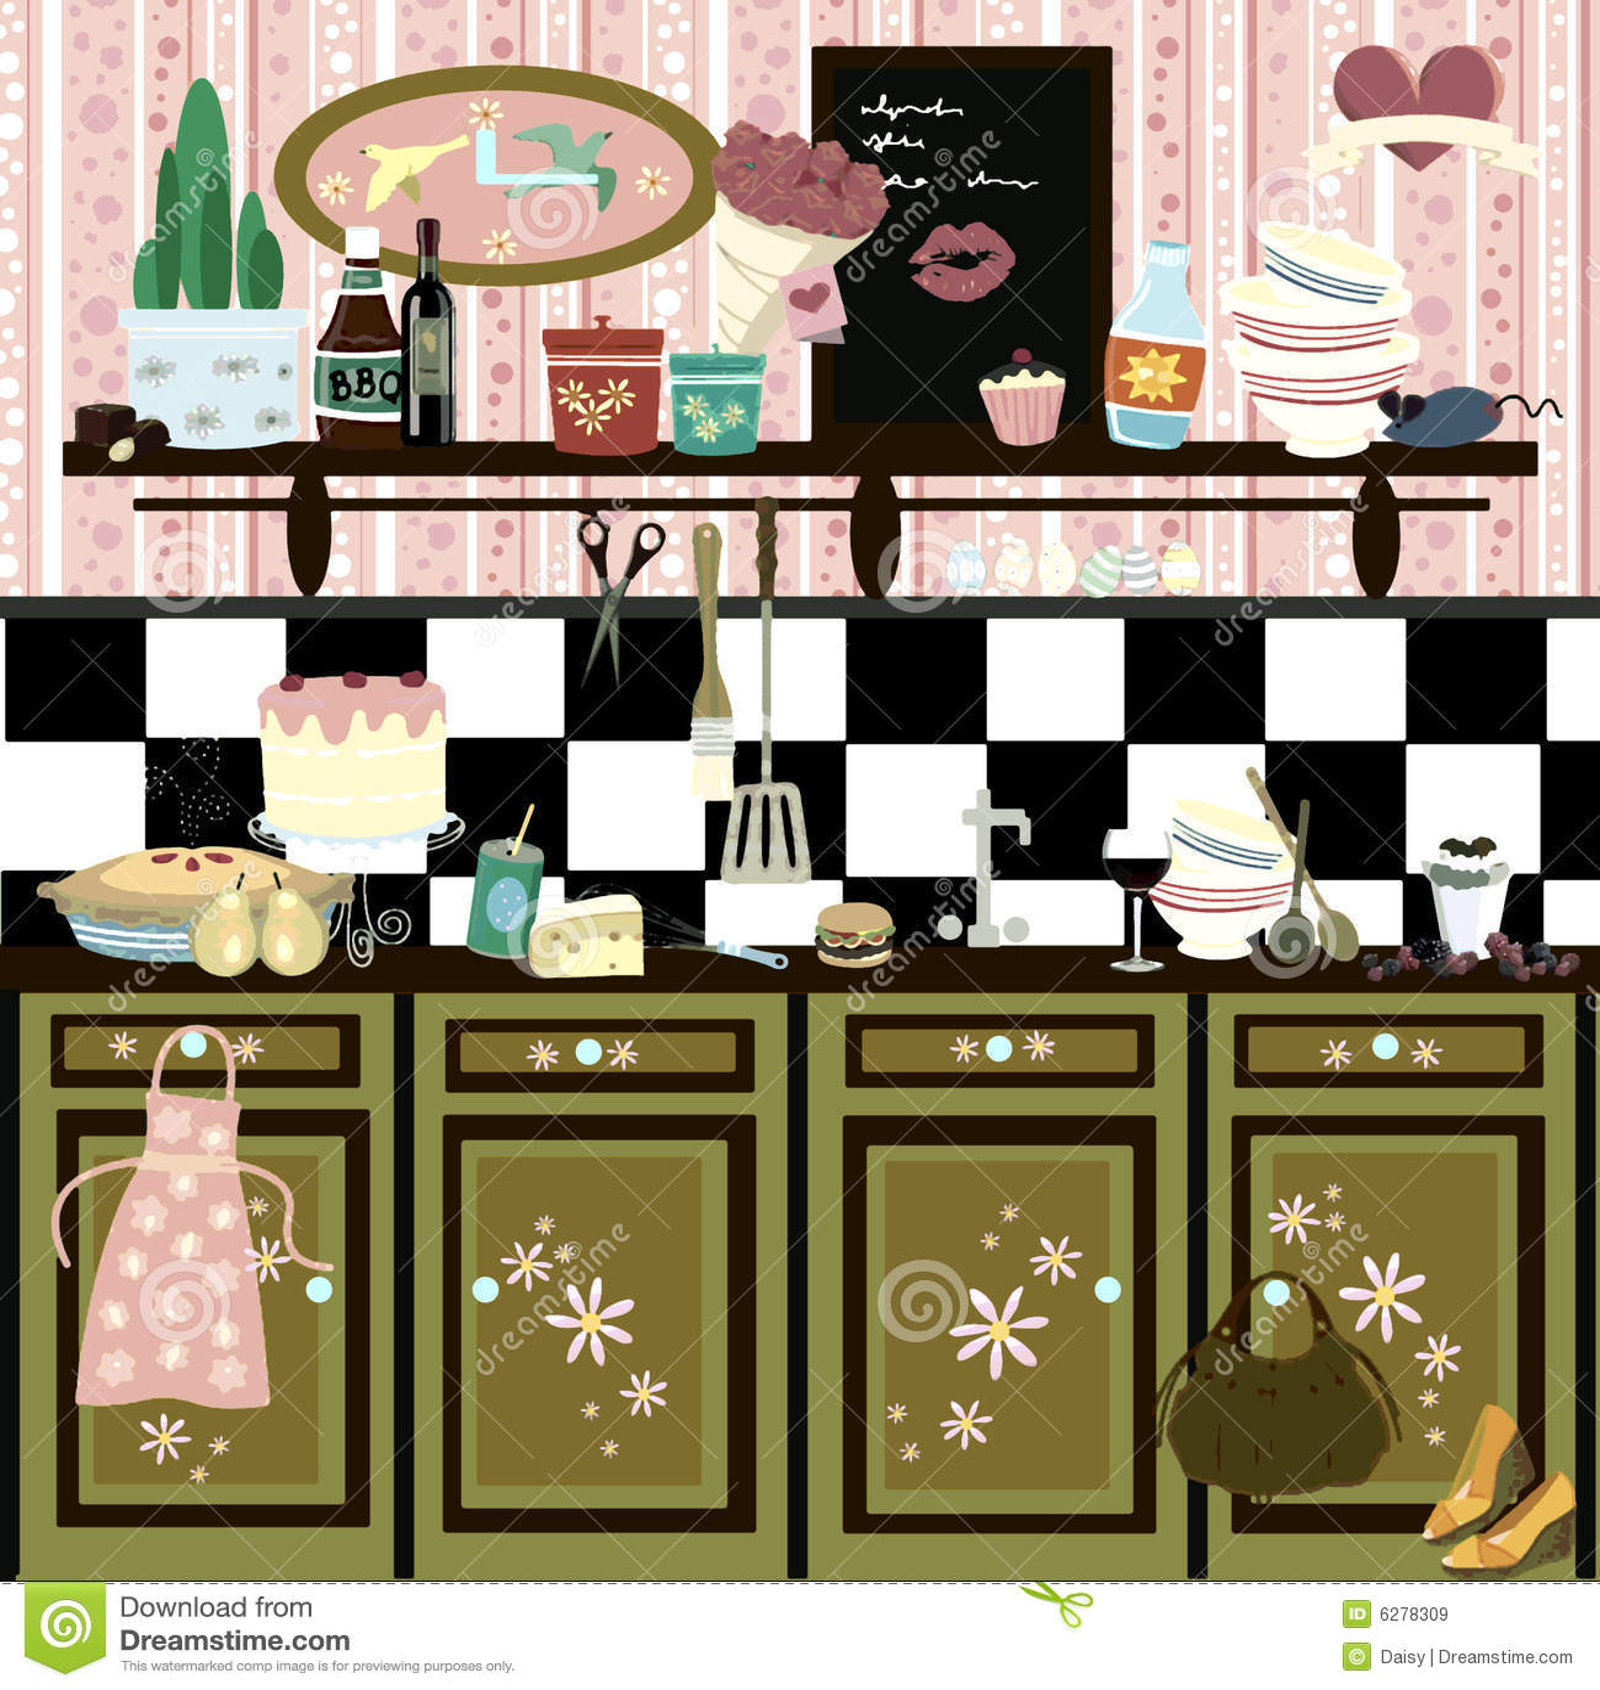 Romantic country style retro kitchen